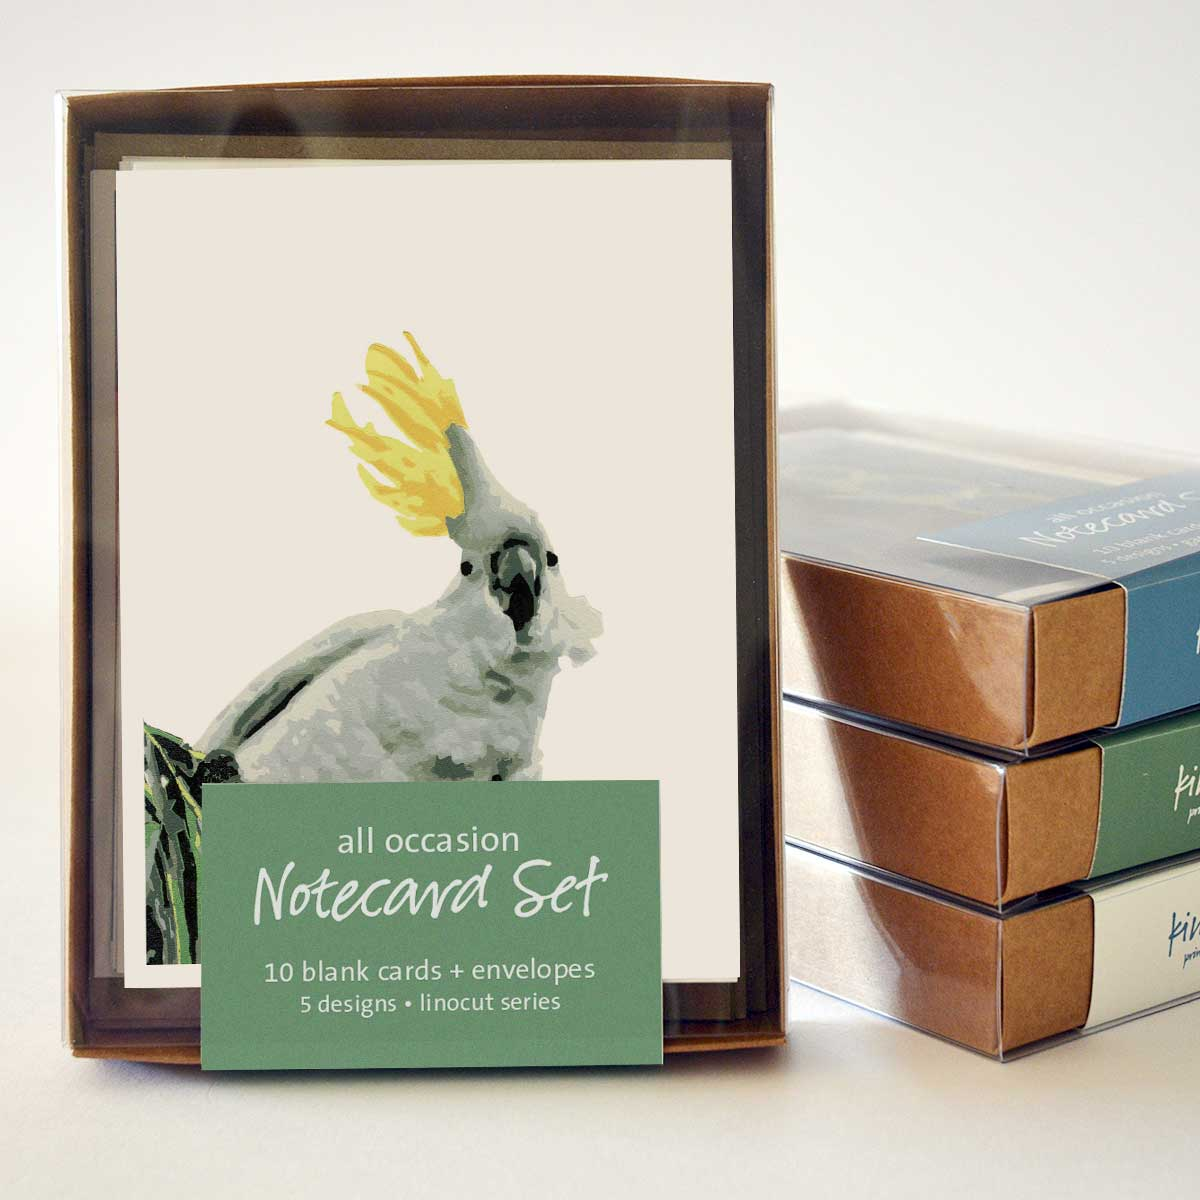 Linocut Notecard Set (10 cards)